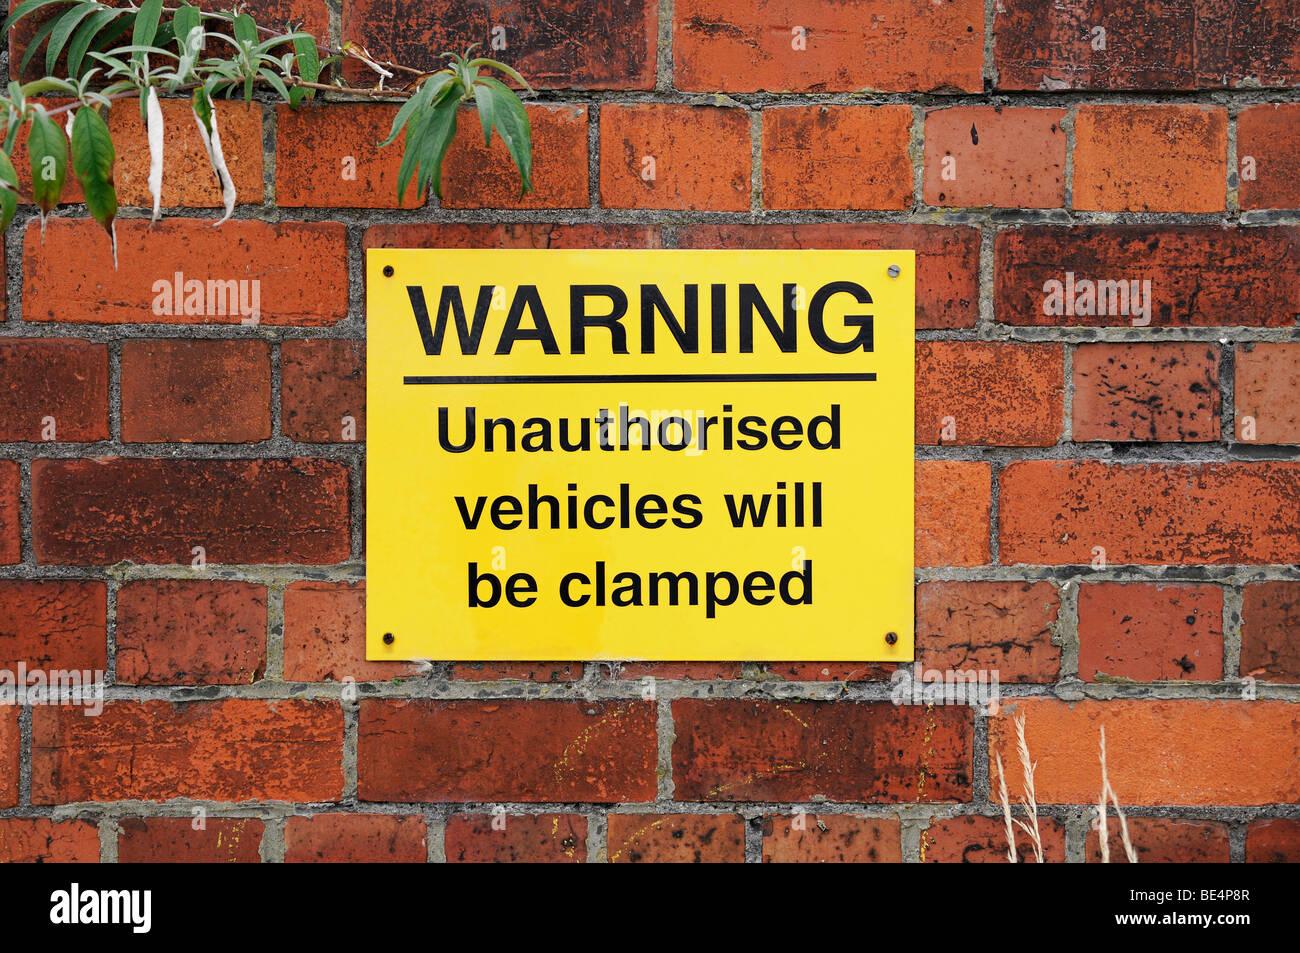 Vehicle Clamping Warning Sign. Oxford, United Kingdom. - Stock Image